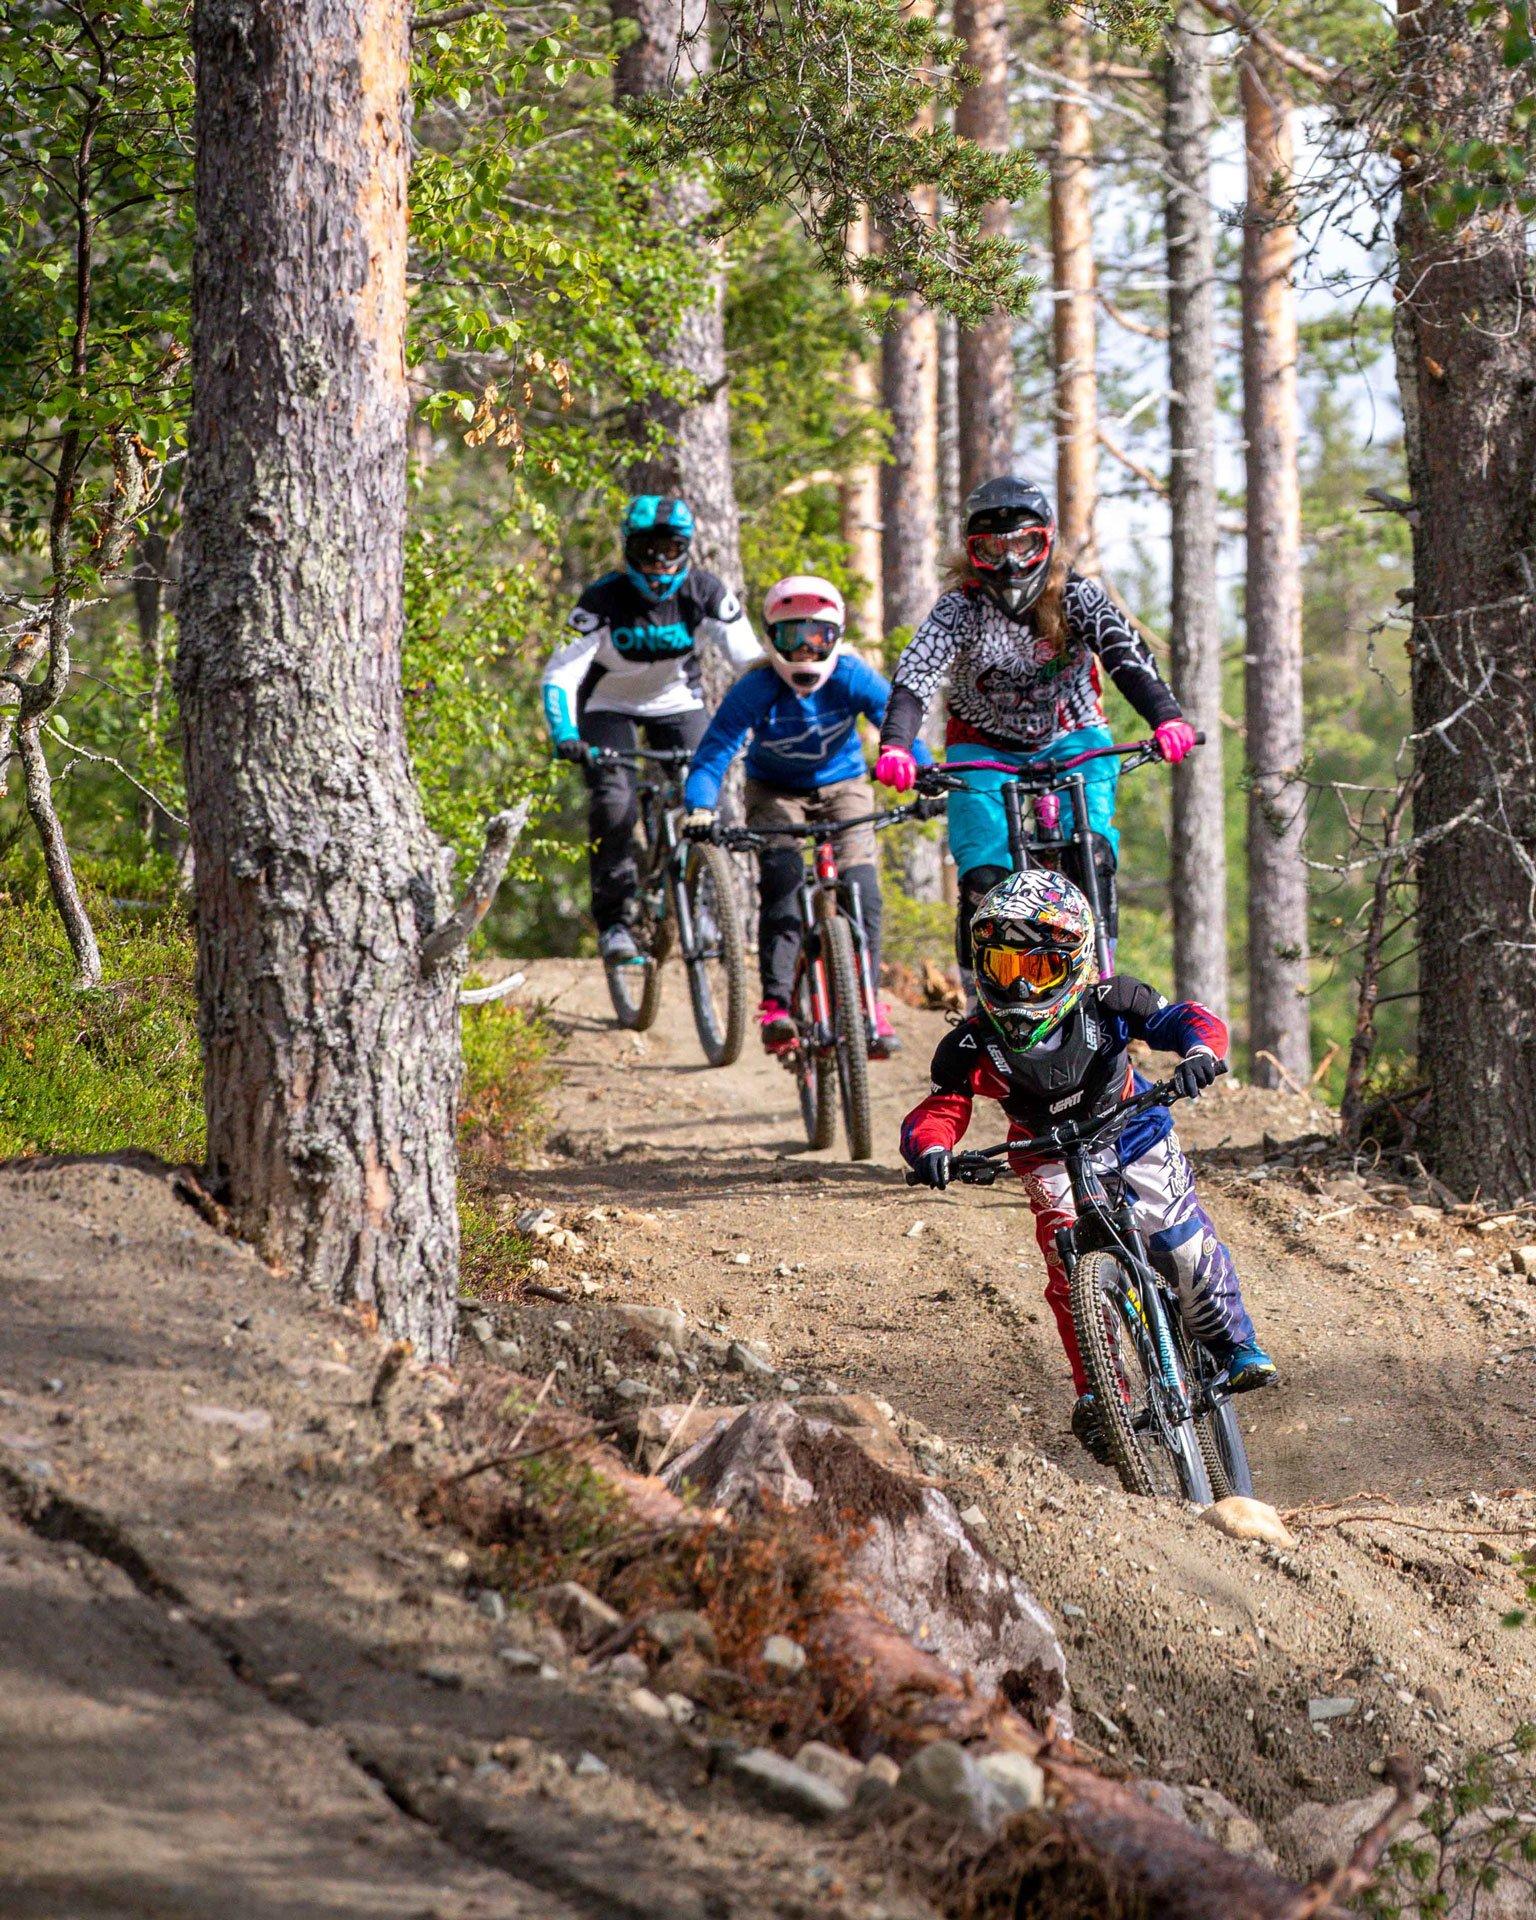 Levi_Bike_Park_woods